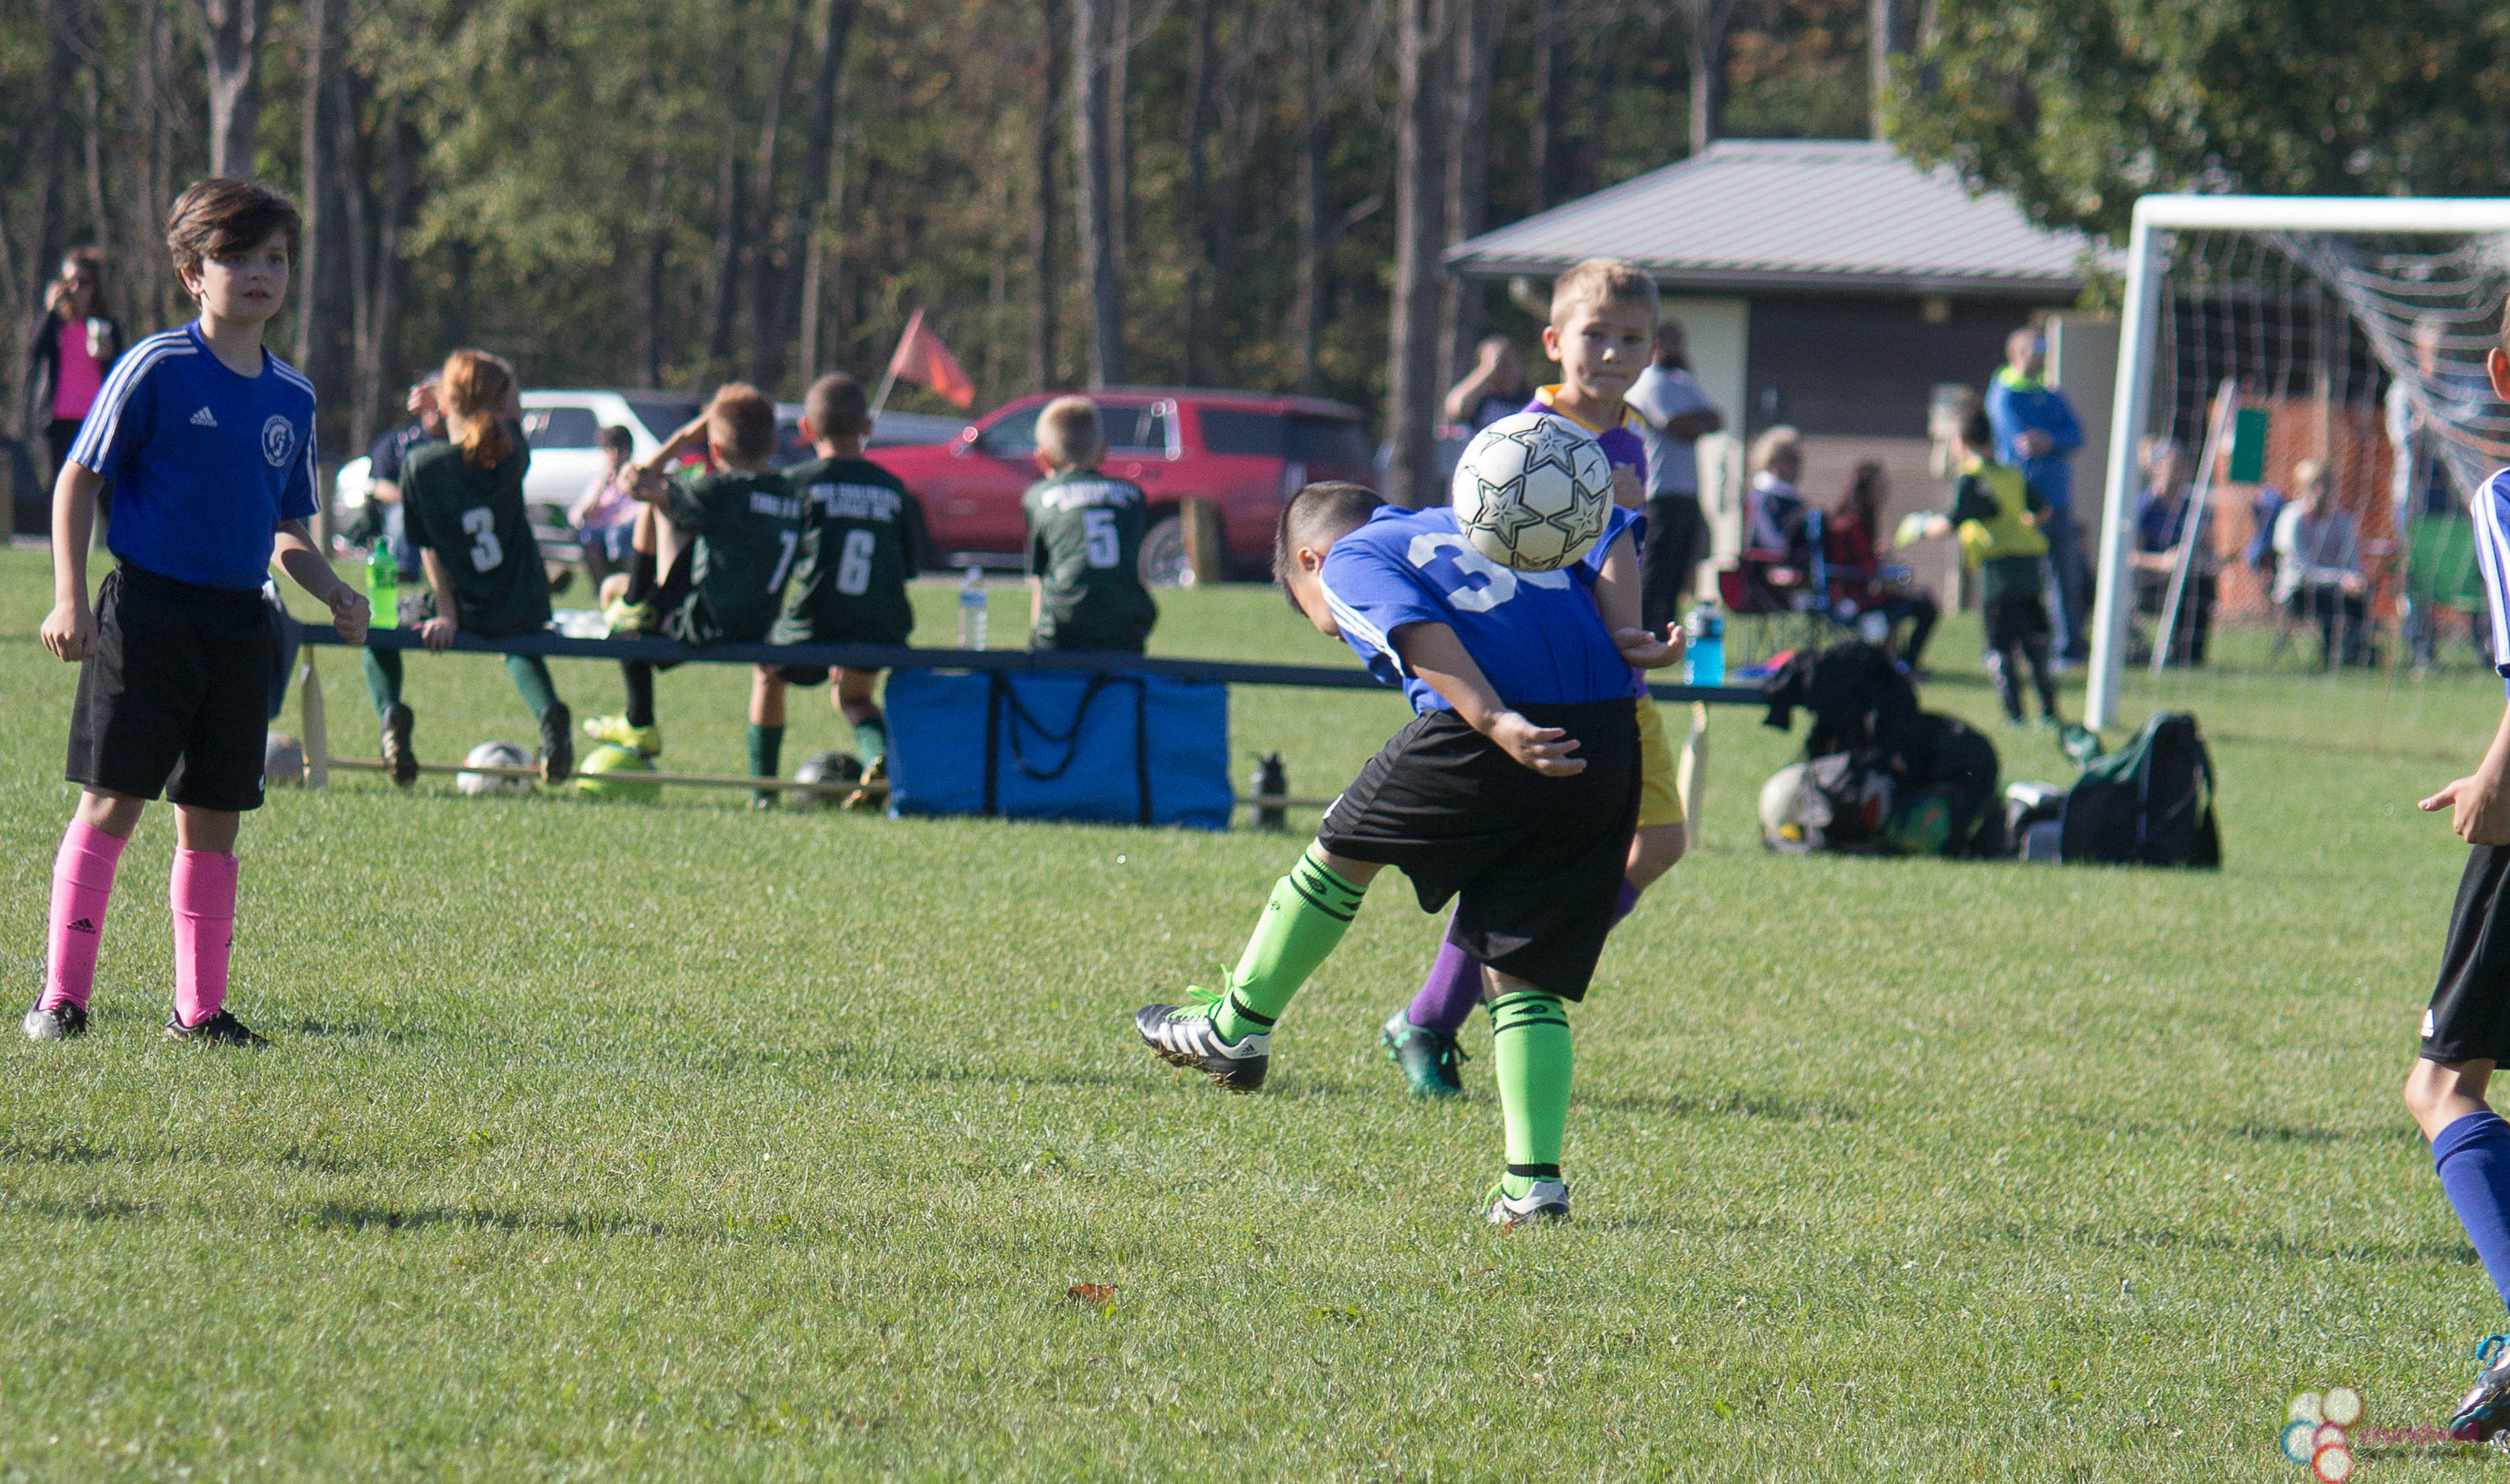 2017-10-14-Spartan-U9-Soccer-Final (39 of 134)